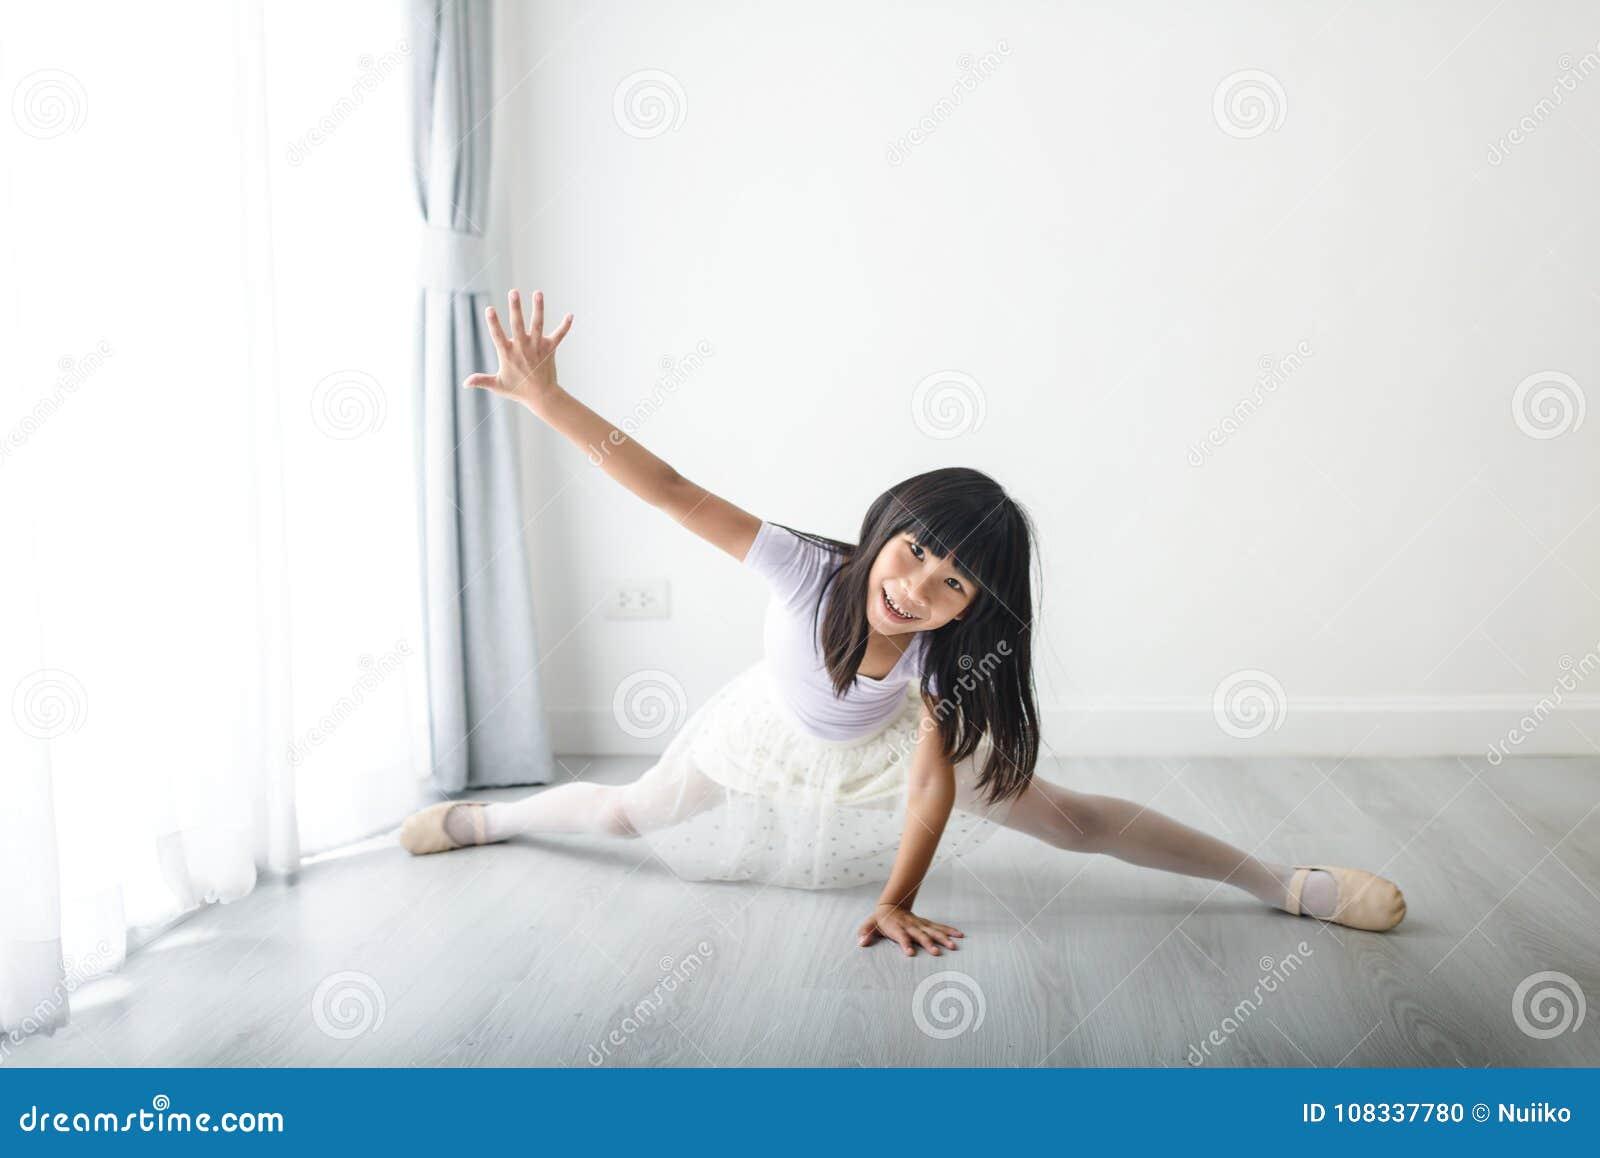 Танцы на дому для девушки